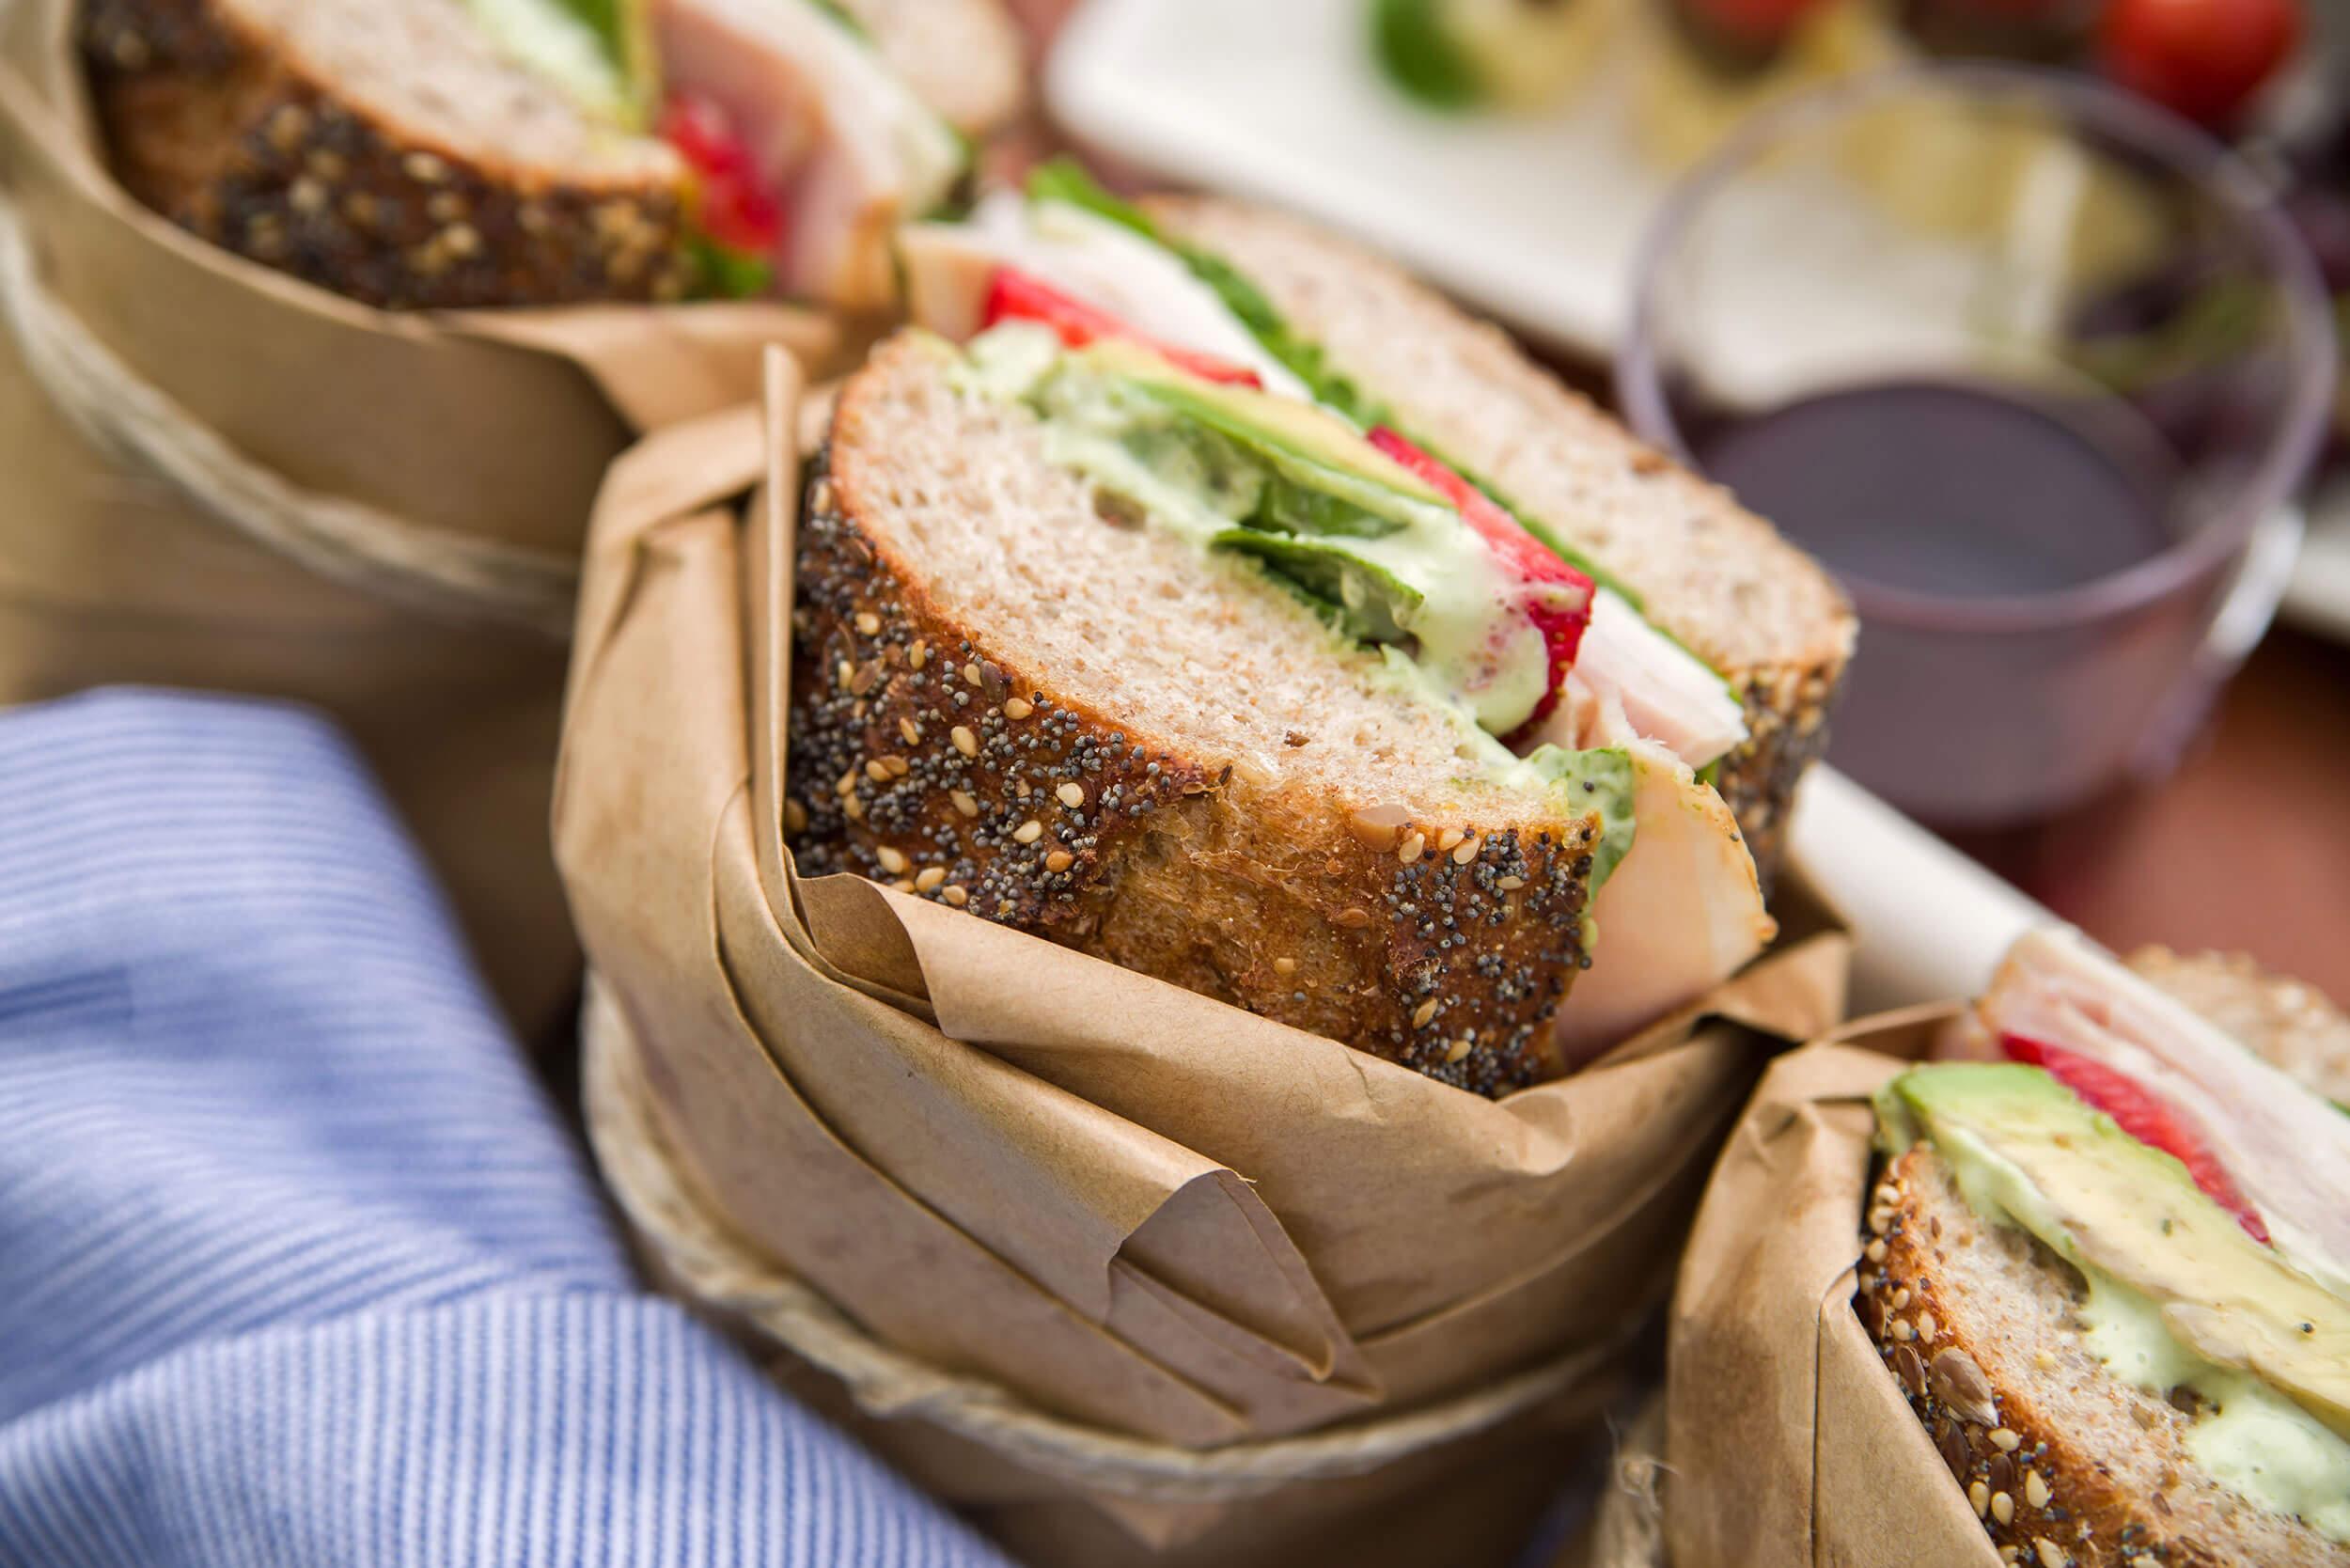 featured-picnic-turkey-strawberry-club-sandwich-platter-close-up-overhead.jpg